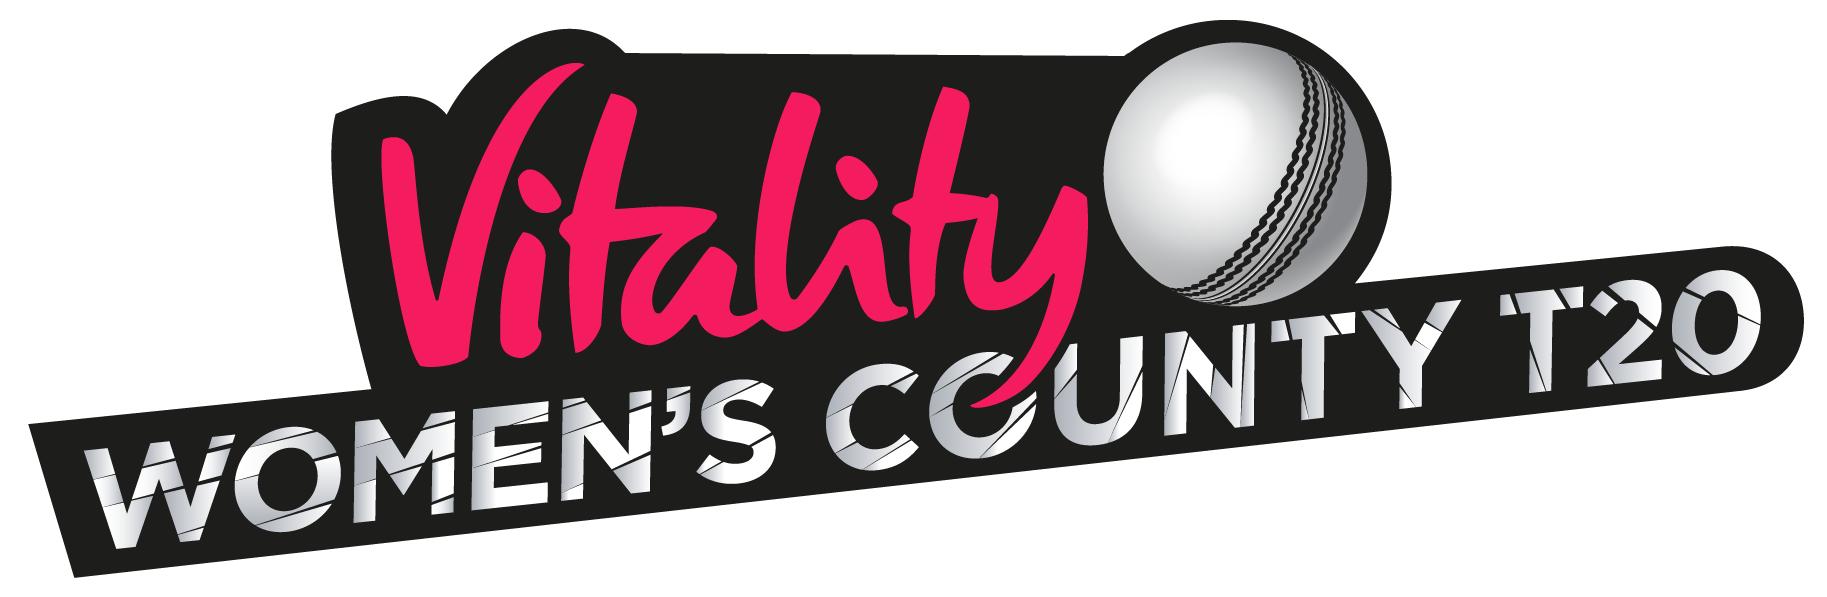 ECB00337_Womens_County_T20_Grad_RGB